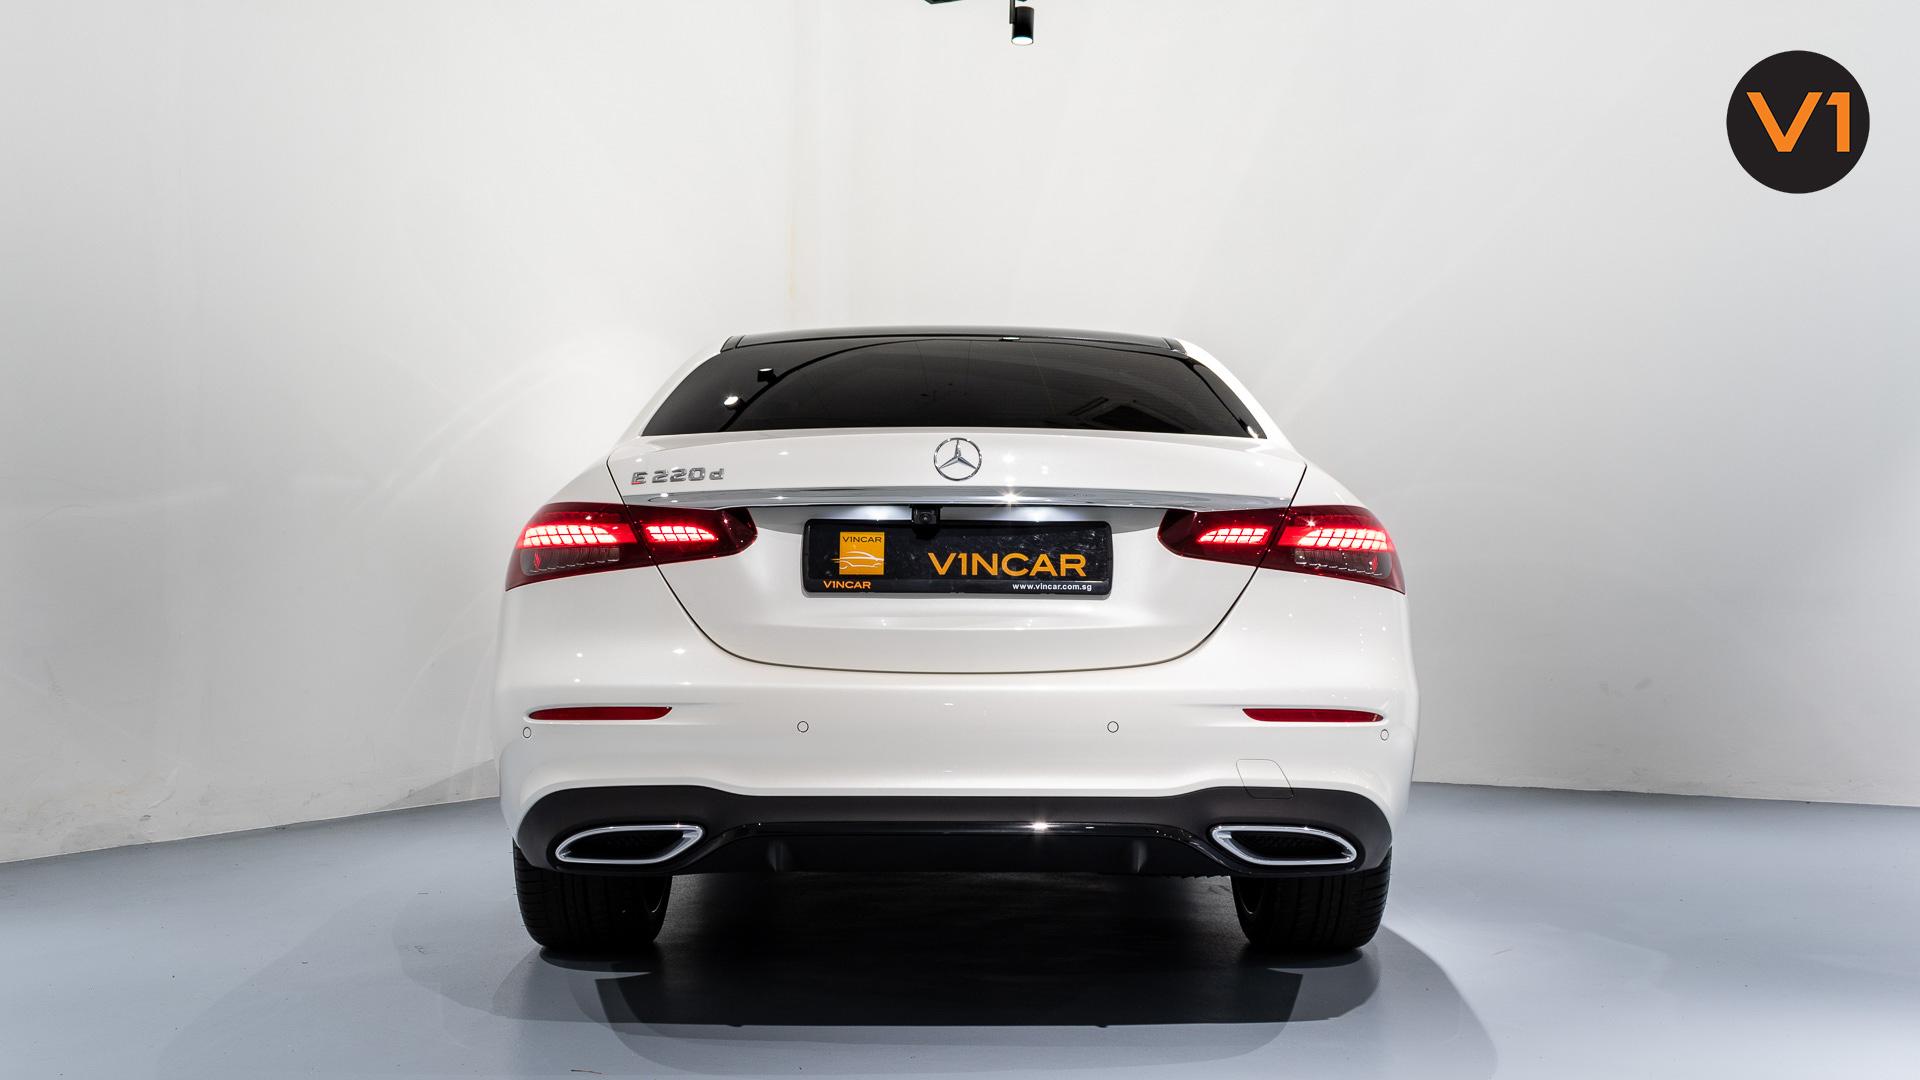 Mercedes-Benz E220d Saloon AMG Line Night Edition Premium Plus (FL2021) - Rear Direct